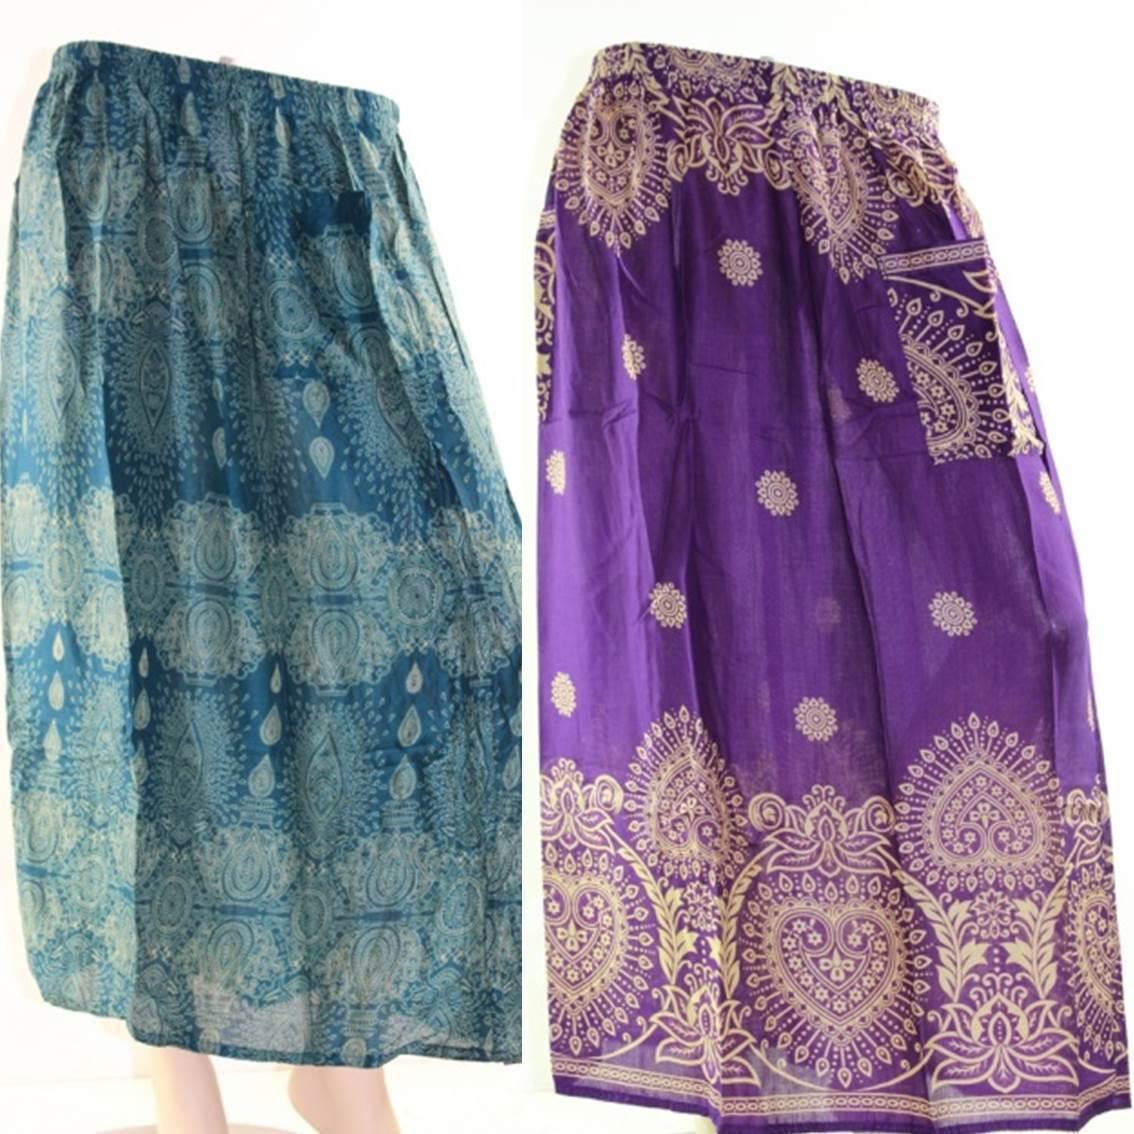 Skirt Casual Plus Size 22 Multi Coloured Bright Summer Rayon Cool Beach Sun